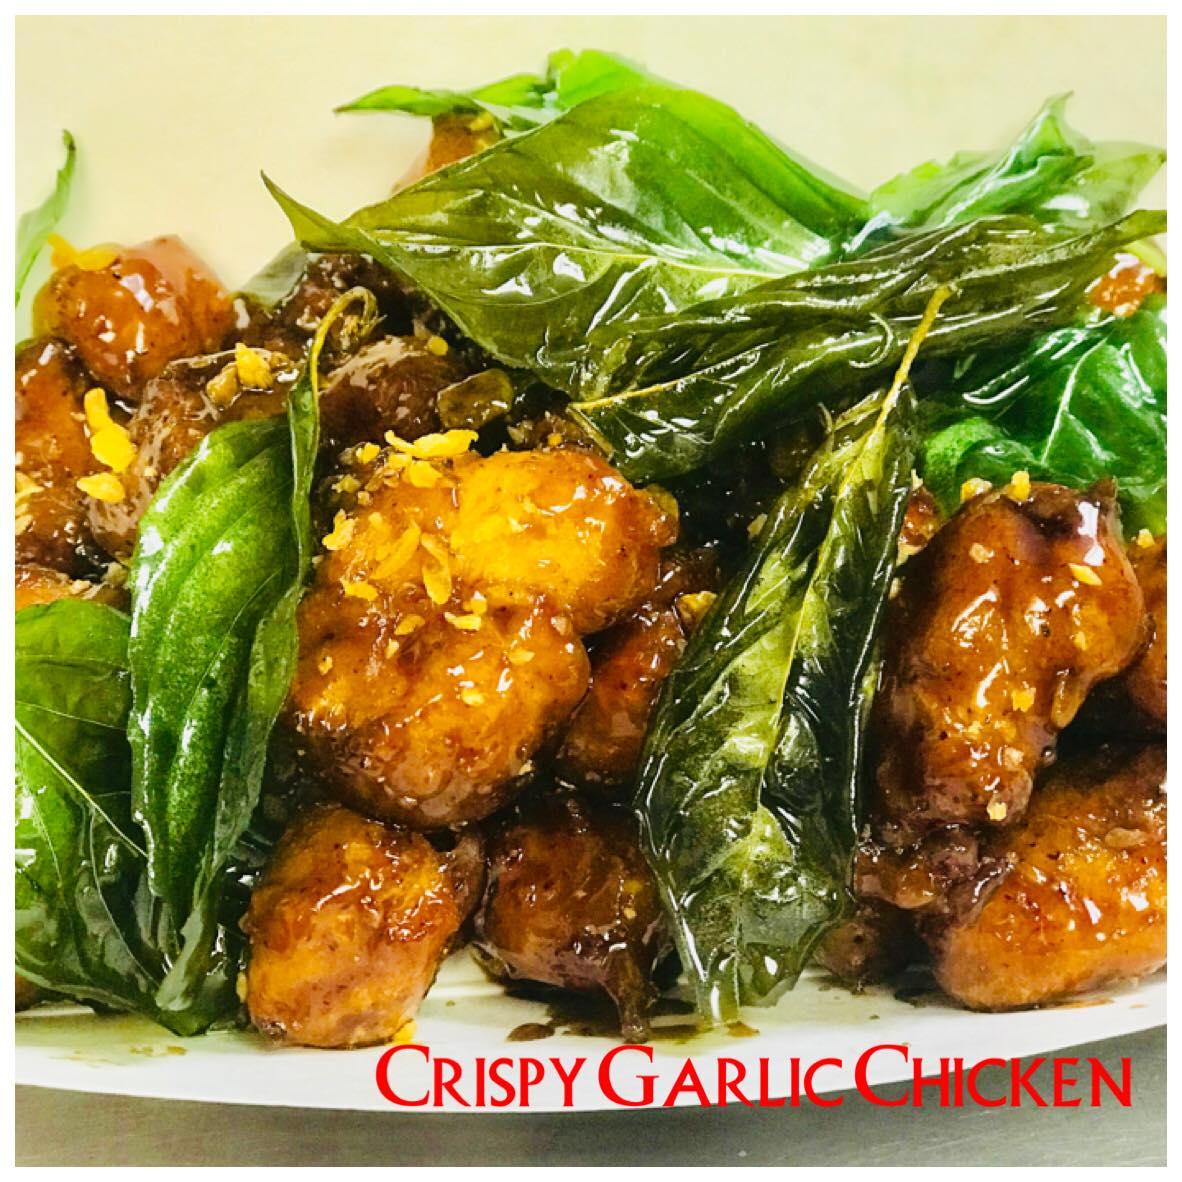 Crispy Garlic Chicken Image